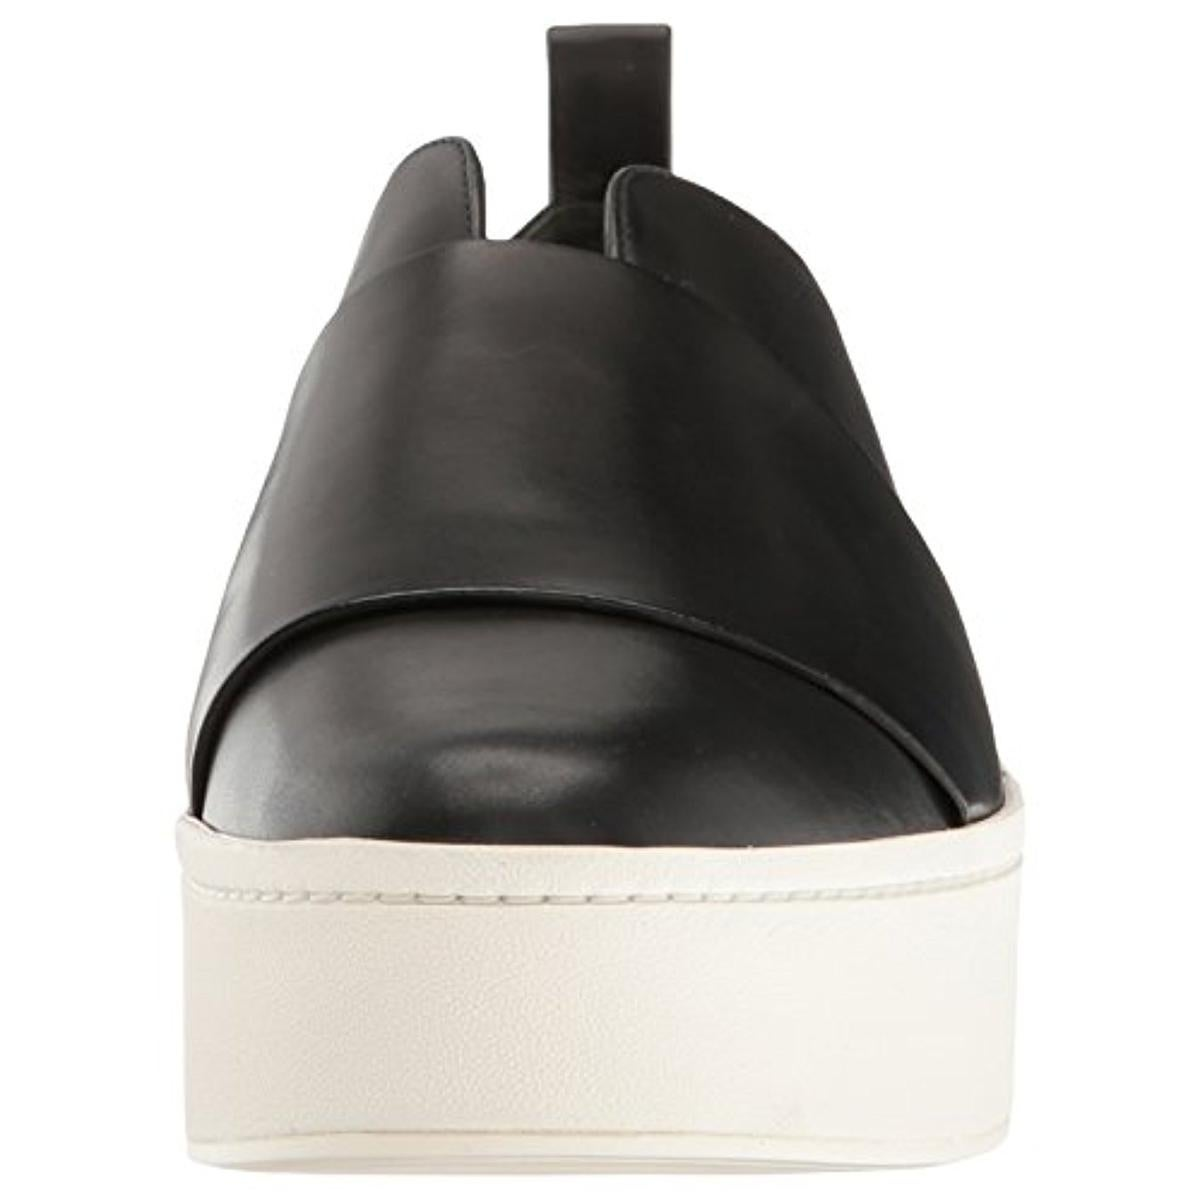 a68e5f779855a Vince Womens Wallace Fashion Sneakers Leather Flatform